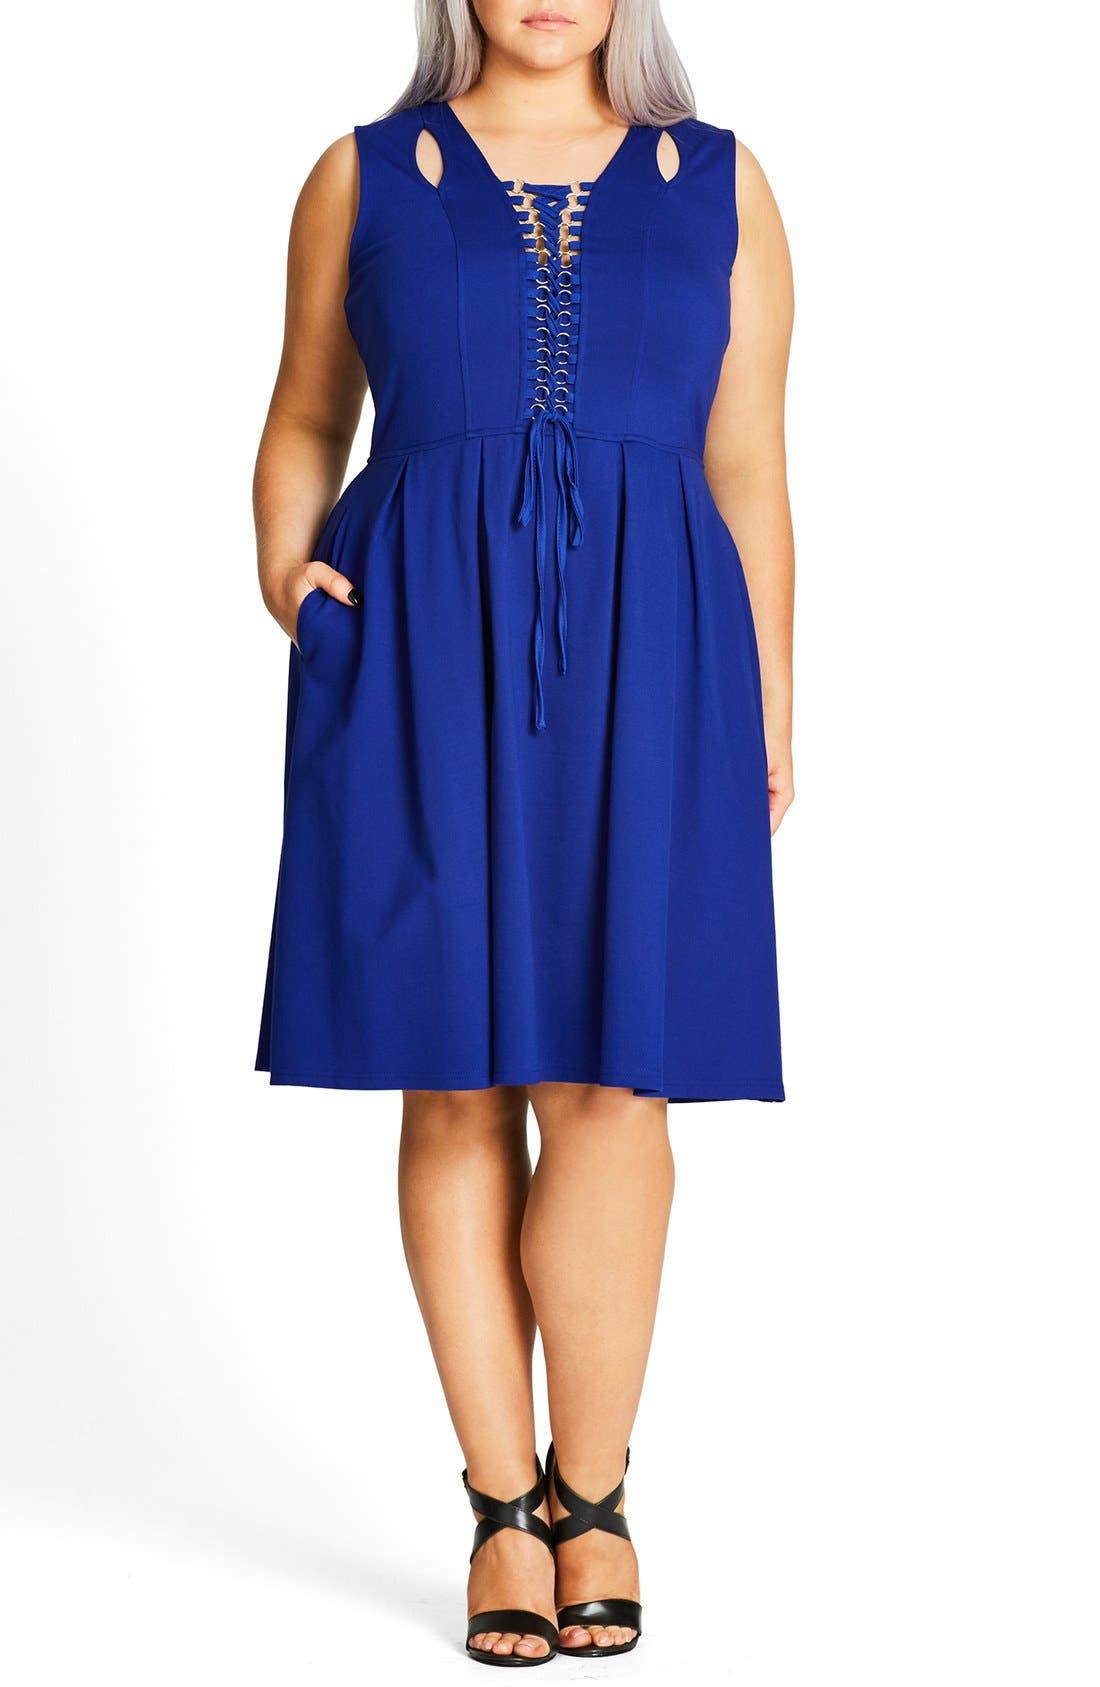 City Chic Lace-Up Fit & Flare Dress (Plus Size)